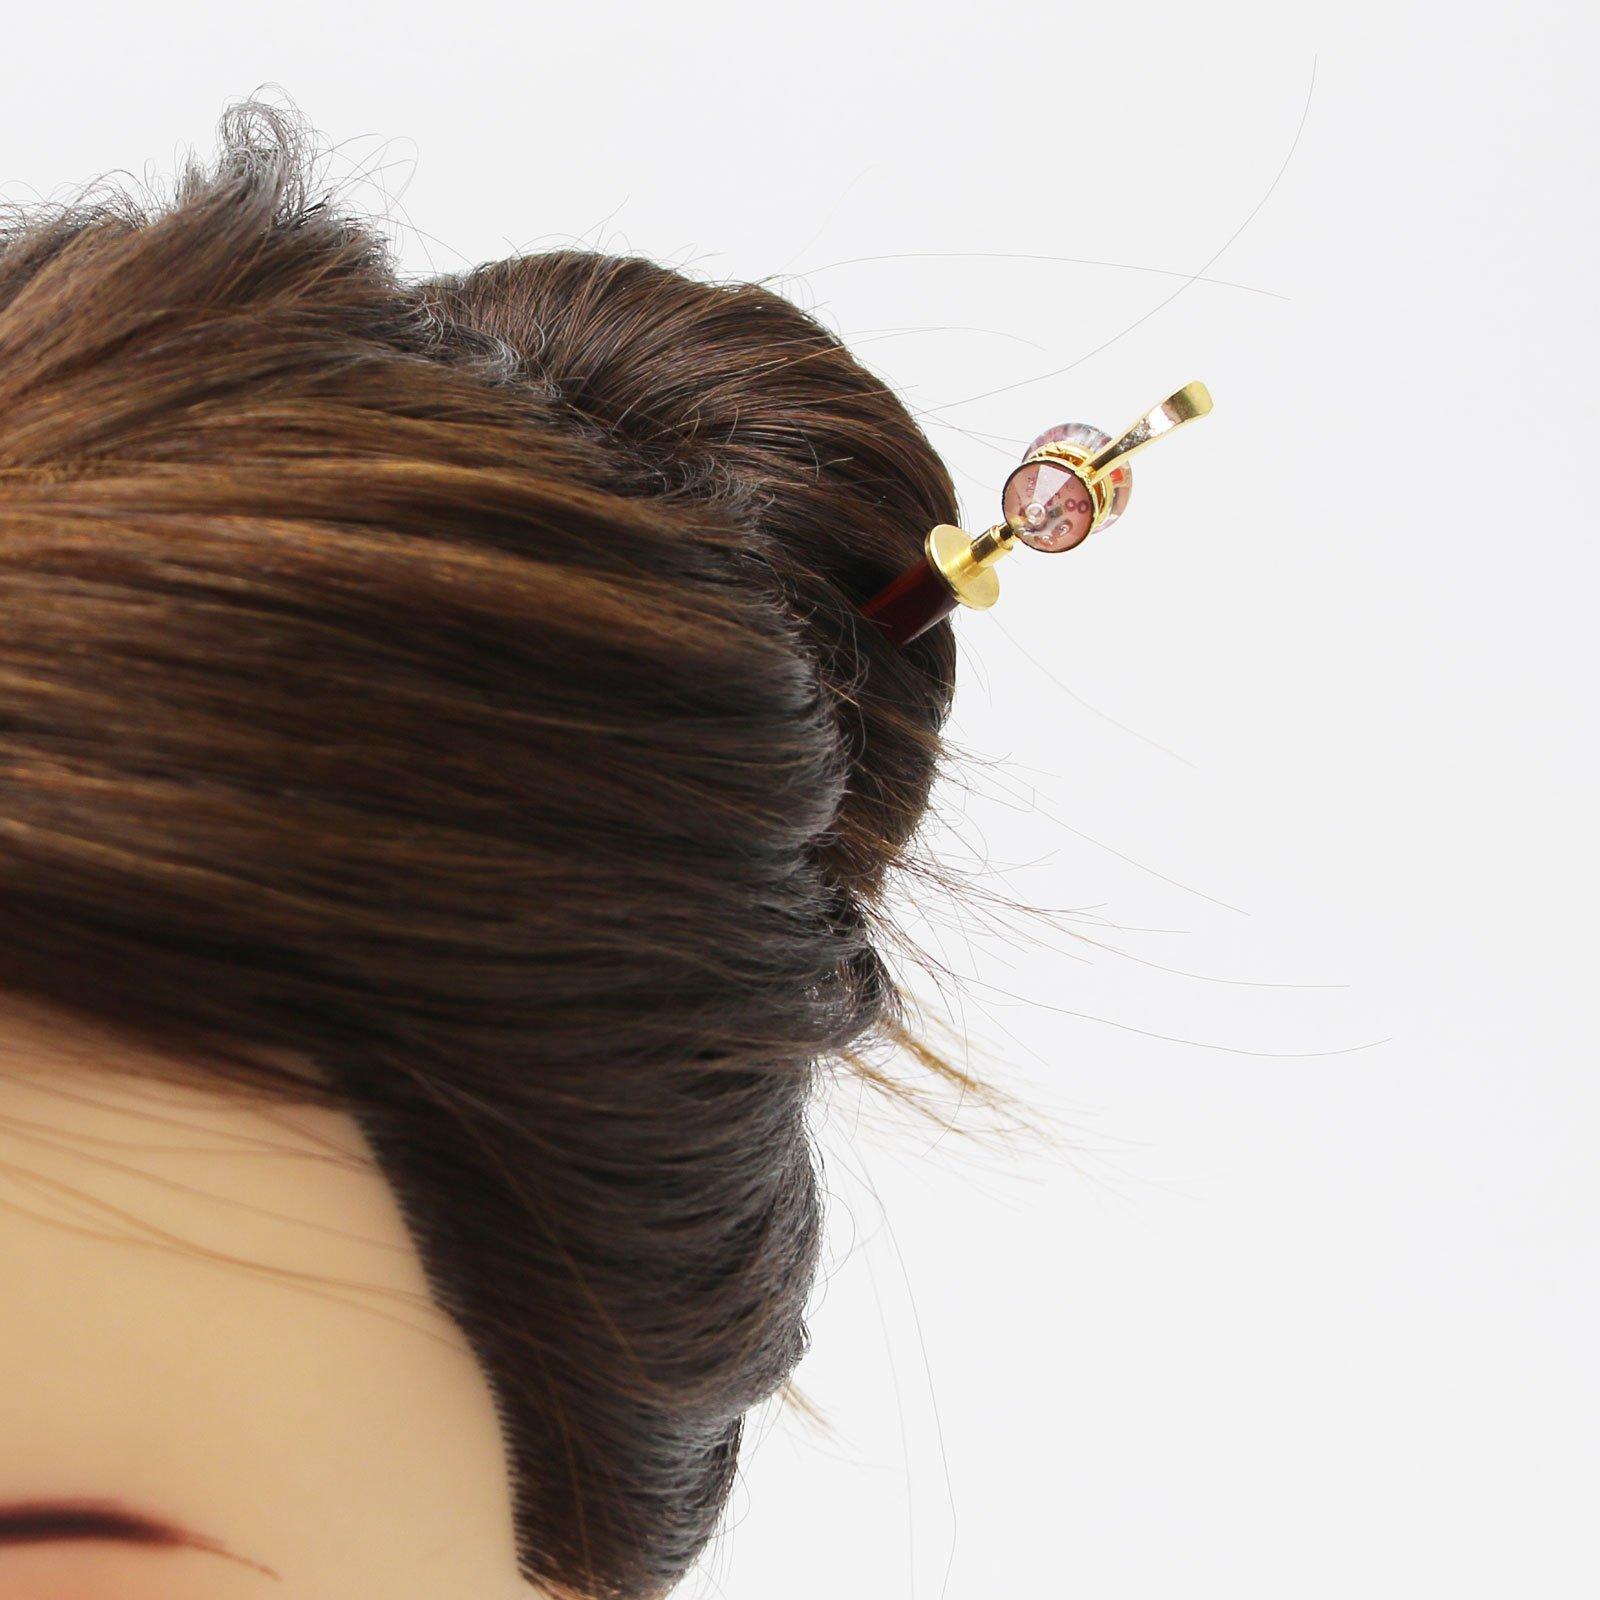 Tamarusan Hair Pin Wooden Plum Green Decoration Removal Hair Stick by TAMARUSAN (Image #5)